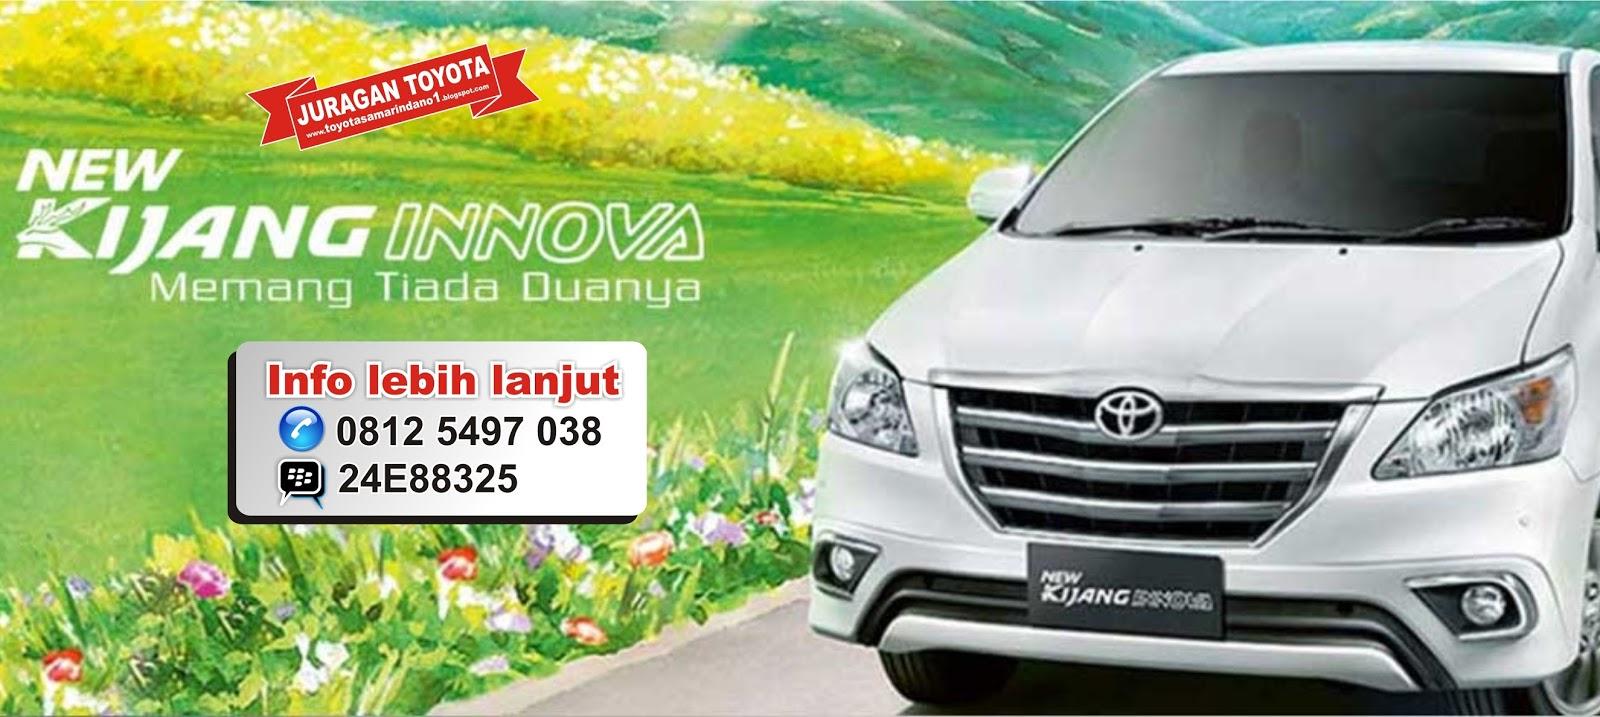 New Kijang Innova Spesifikasi All Camry 2.5 L A/t Hybrid 08125497038 Toyota Jual Harga Diesel Type